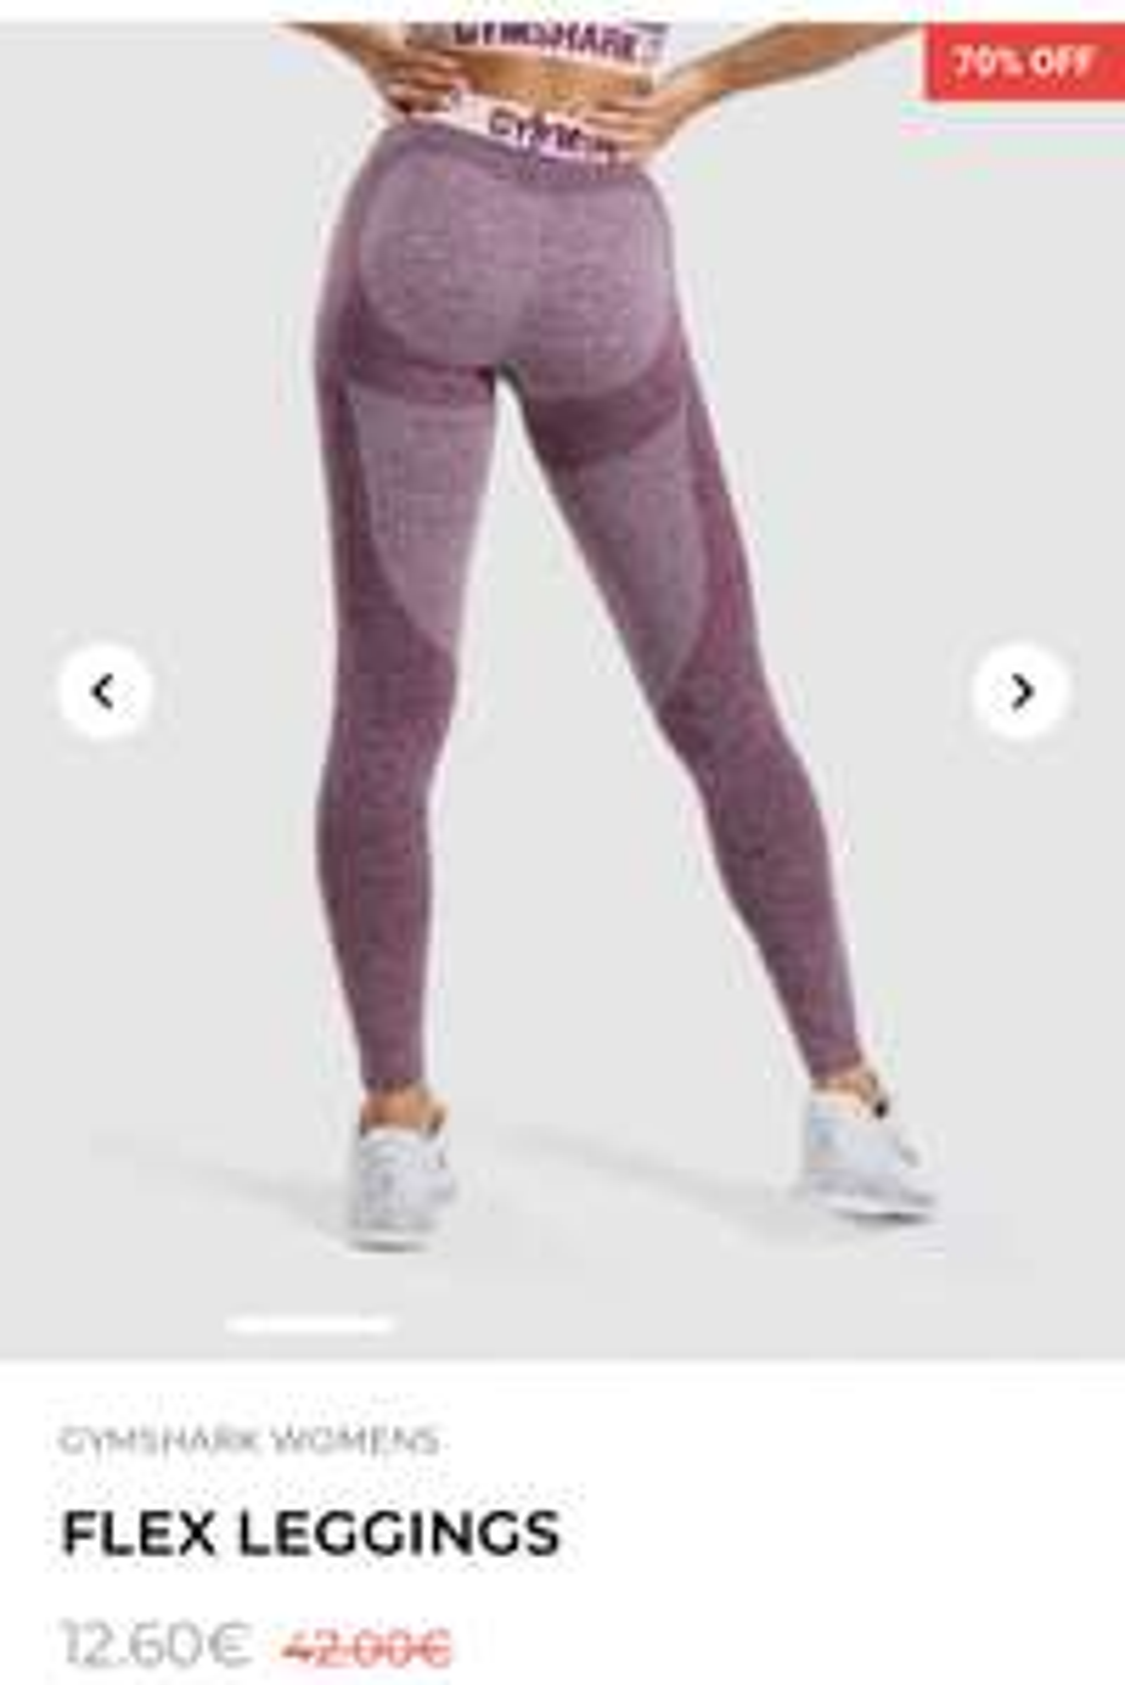 Gymshark Blackout Sale - Fitness Bekleidung mit 20-70% Rabatt